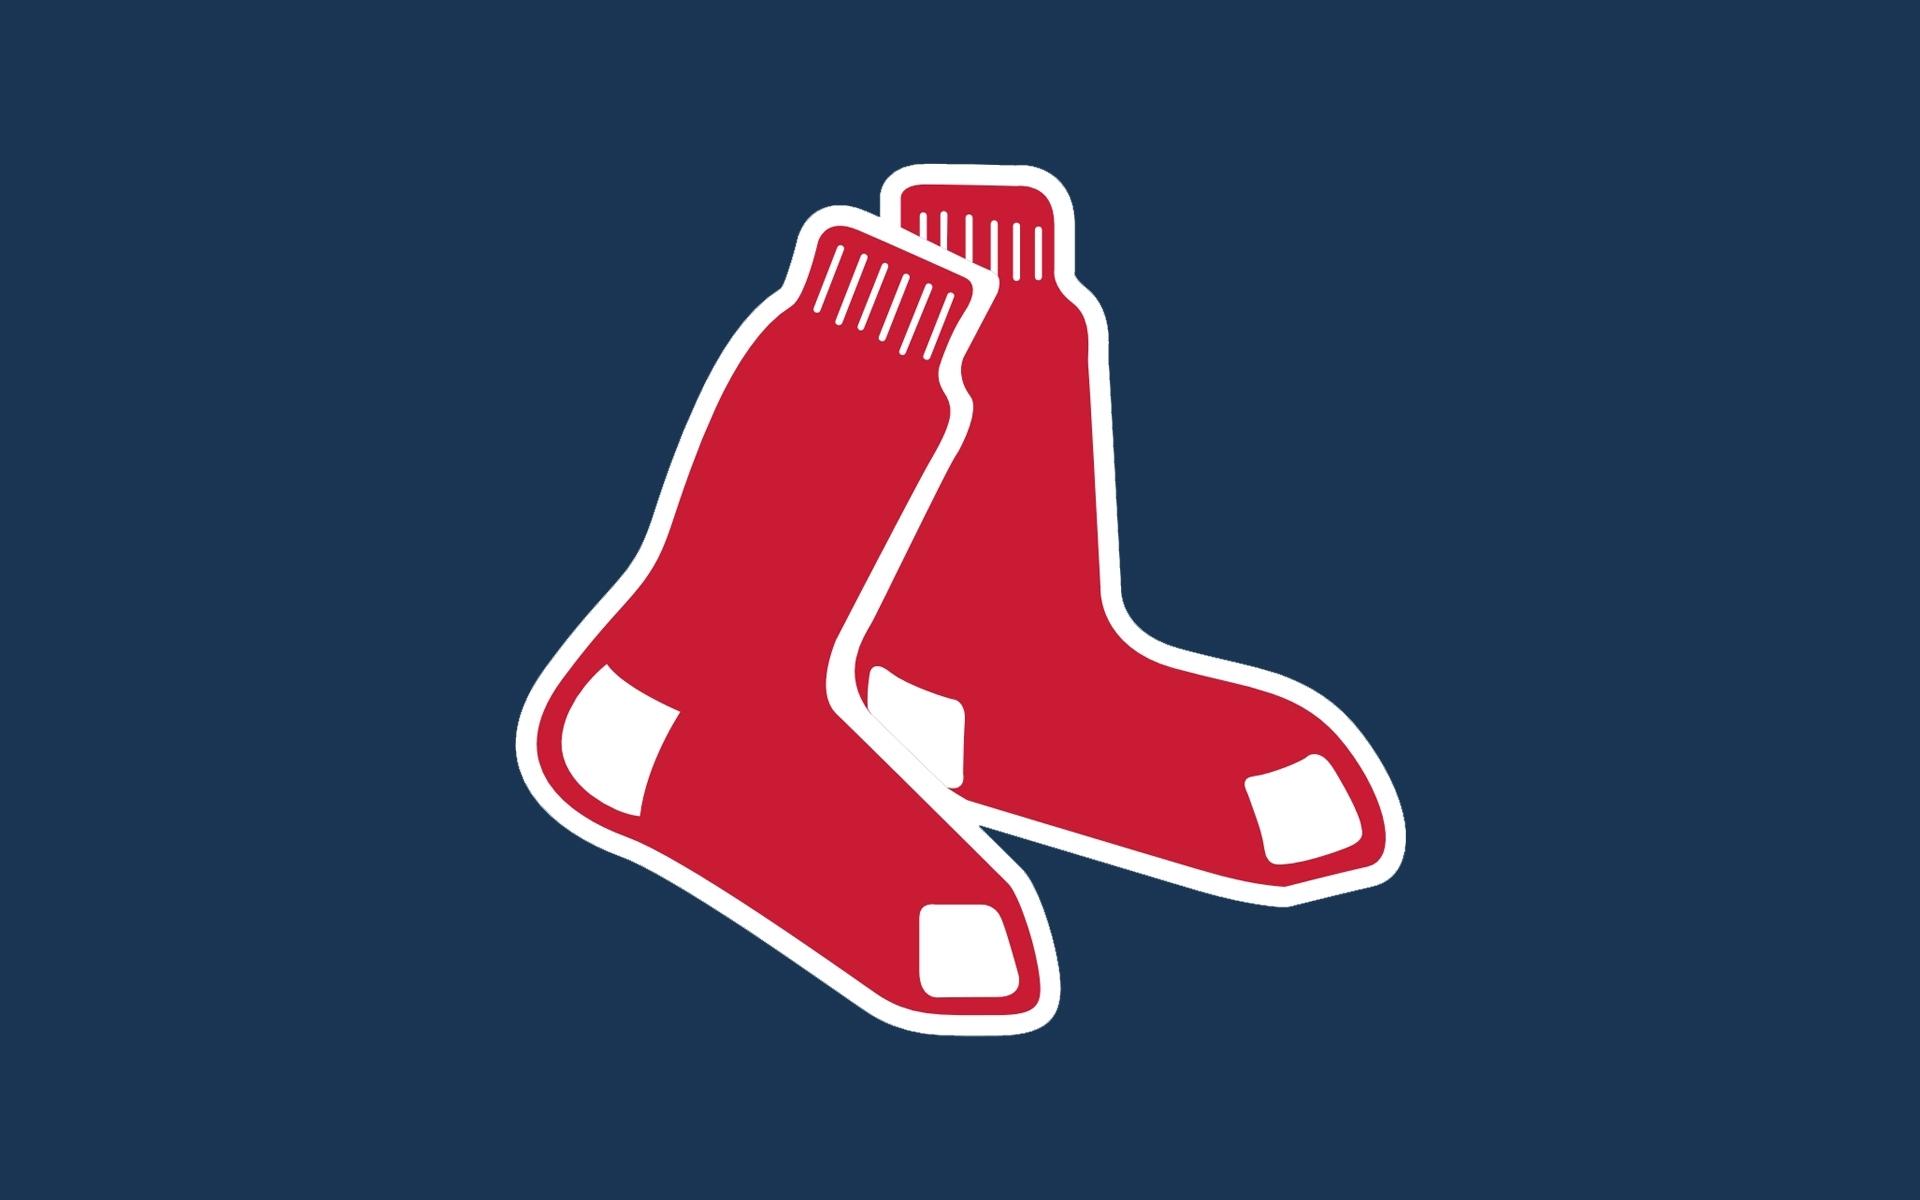 boston red sox logo wallpaper free download | wallpapers | pinterest